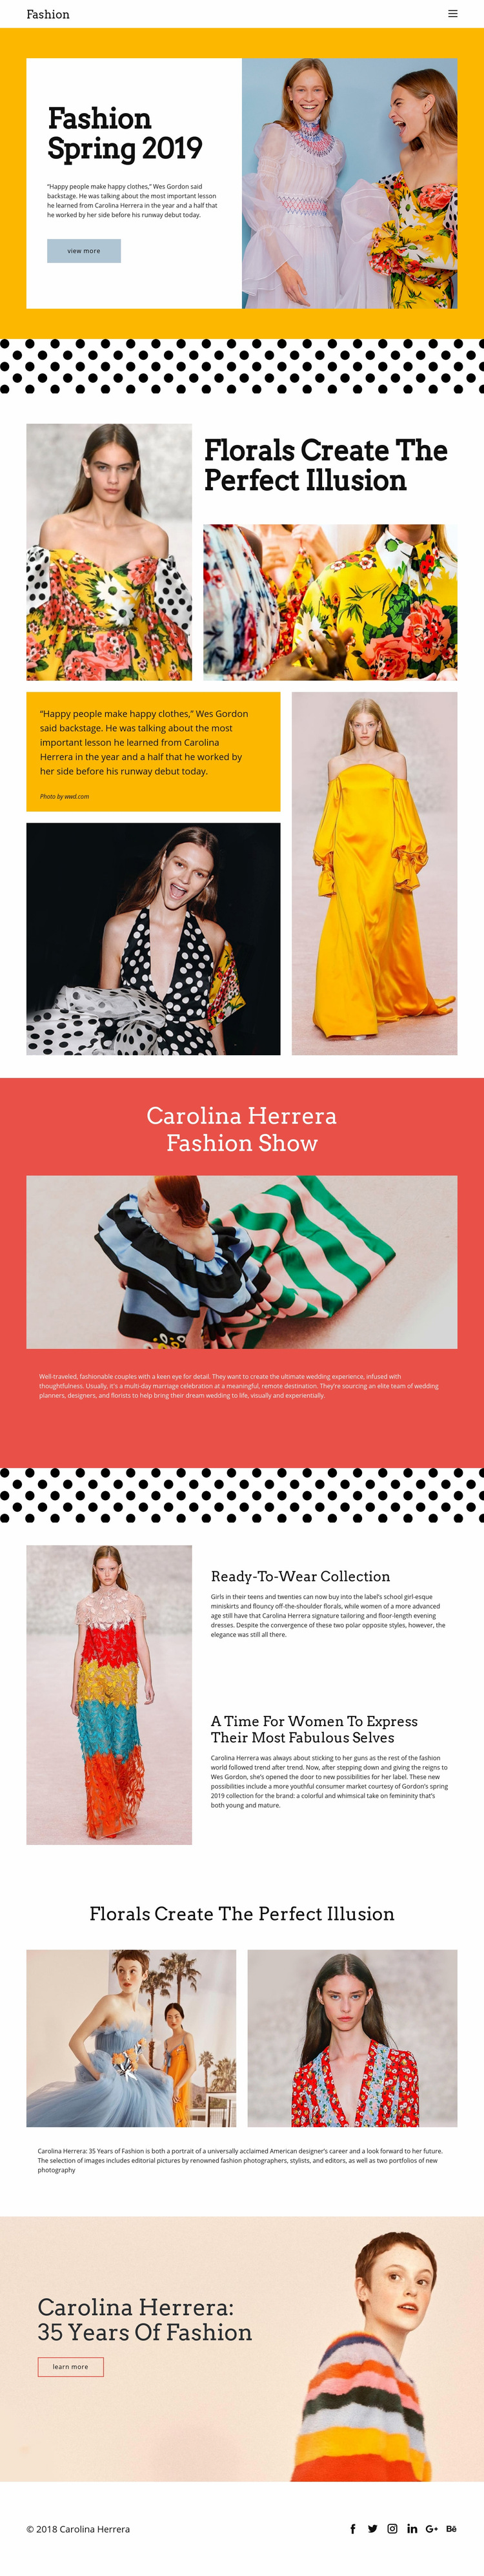 Fashion Spring Web Page Design